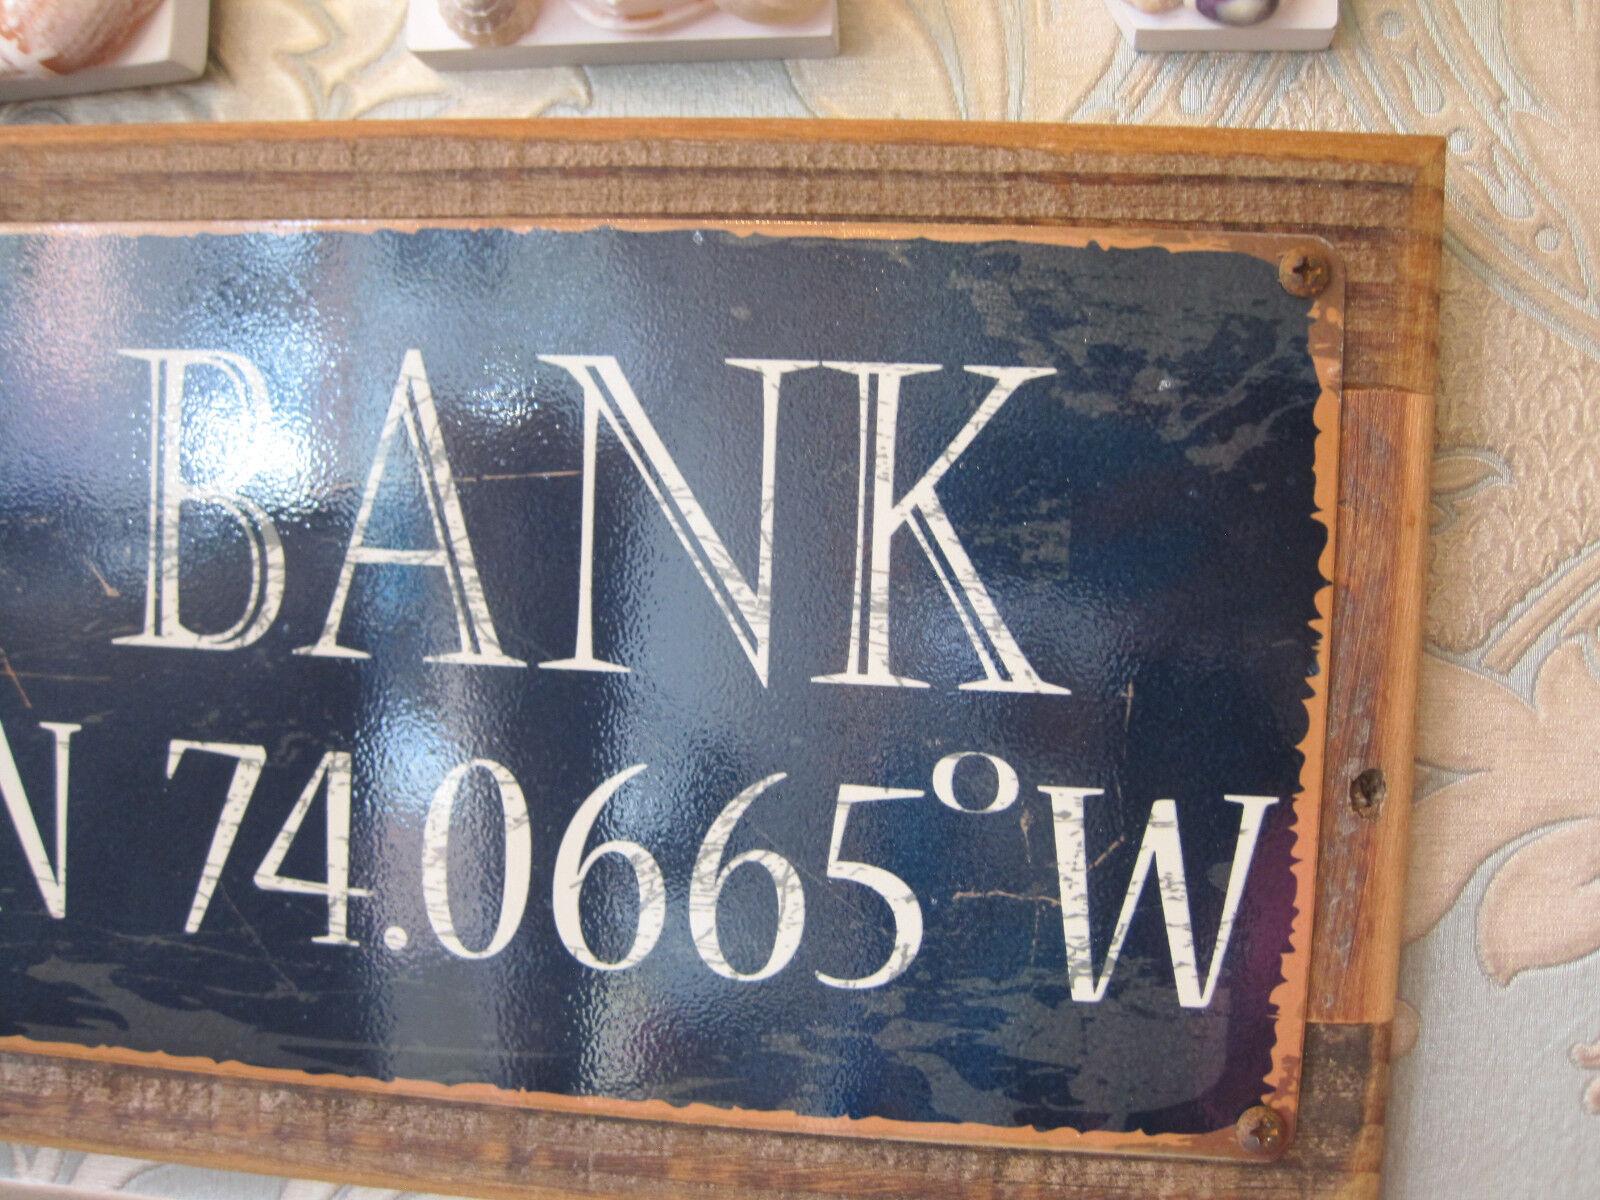 Red Bank Sign Custom Wooden Sign Beach Decor Coastal Home Decor Nj 3 3 Of 4